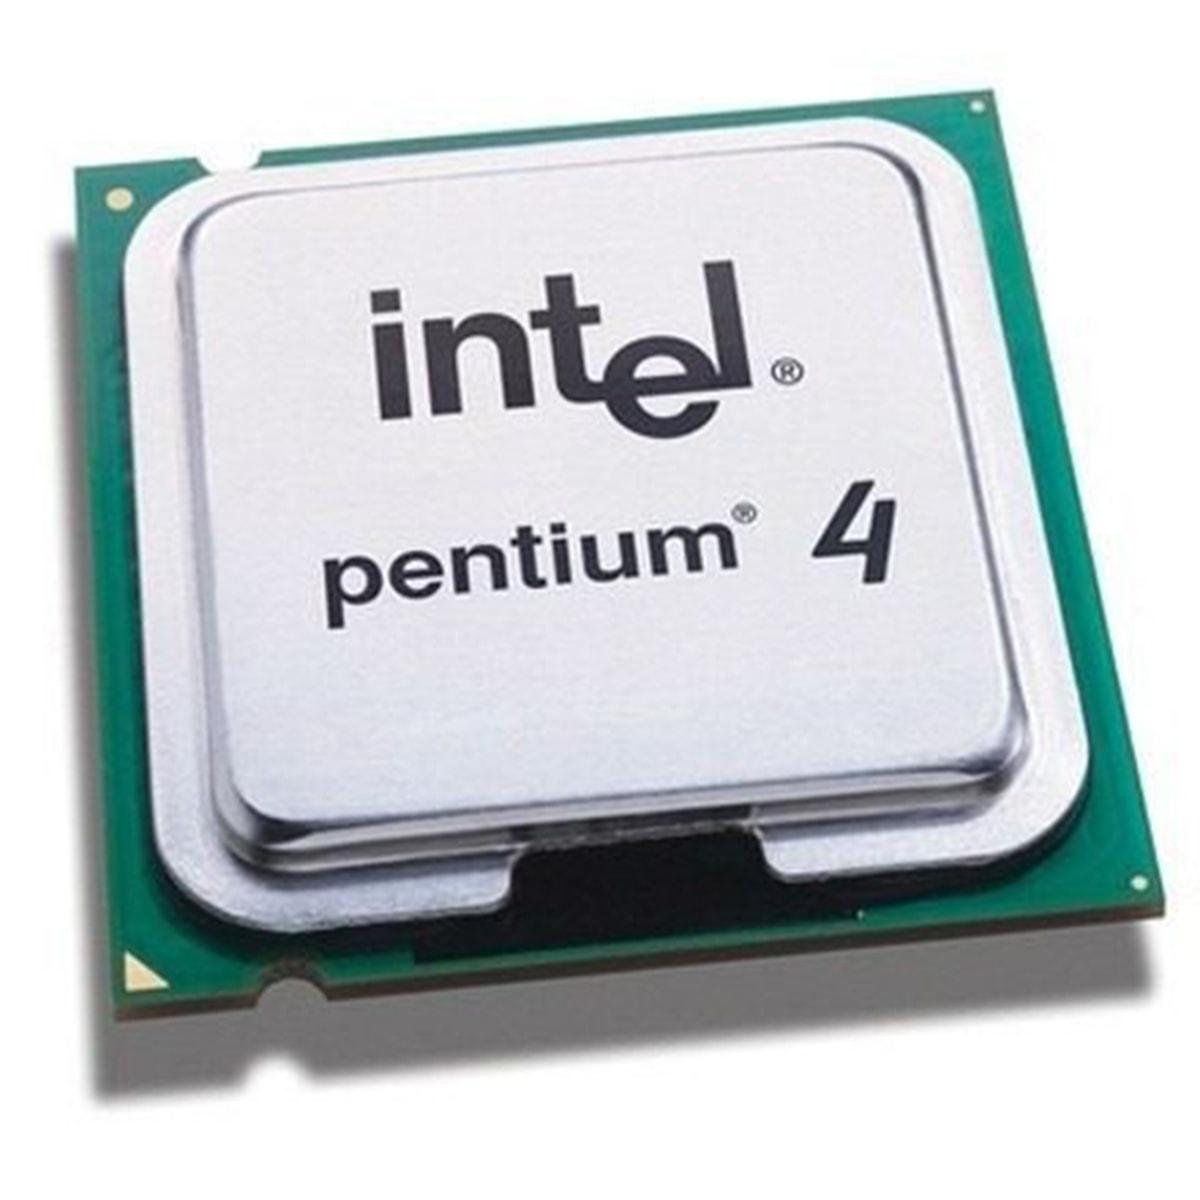 Processador Intel Pentium 4 HT 521 1M Cache / 2.80 GHz / 800 MHz / Socket 775 - Seminovo